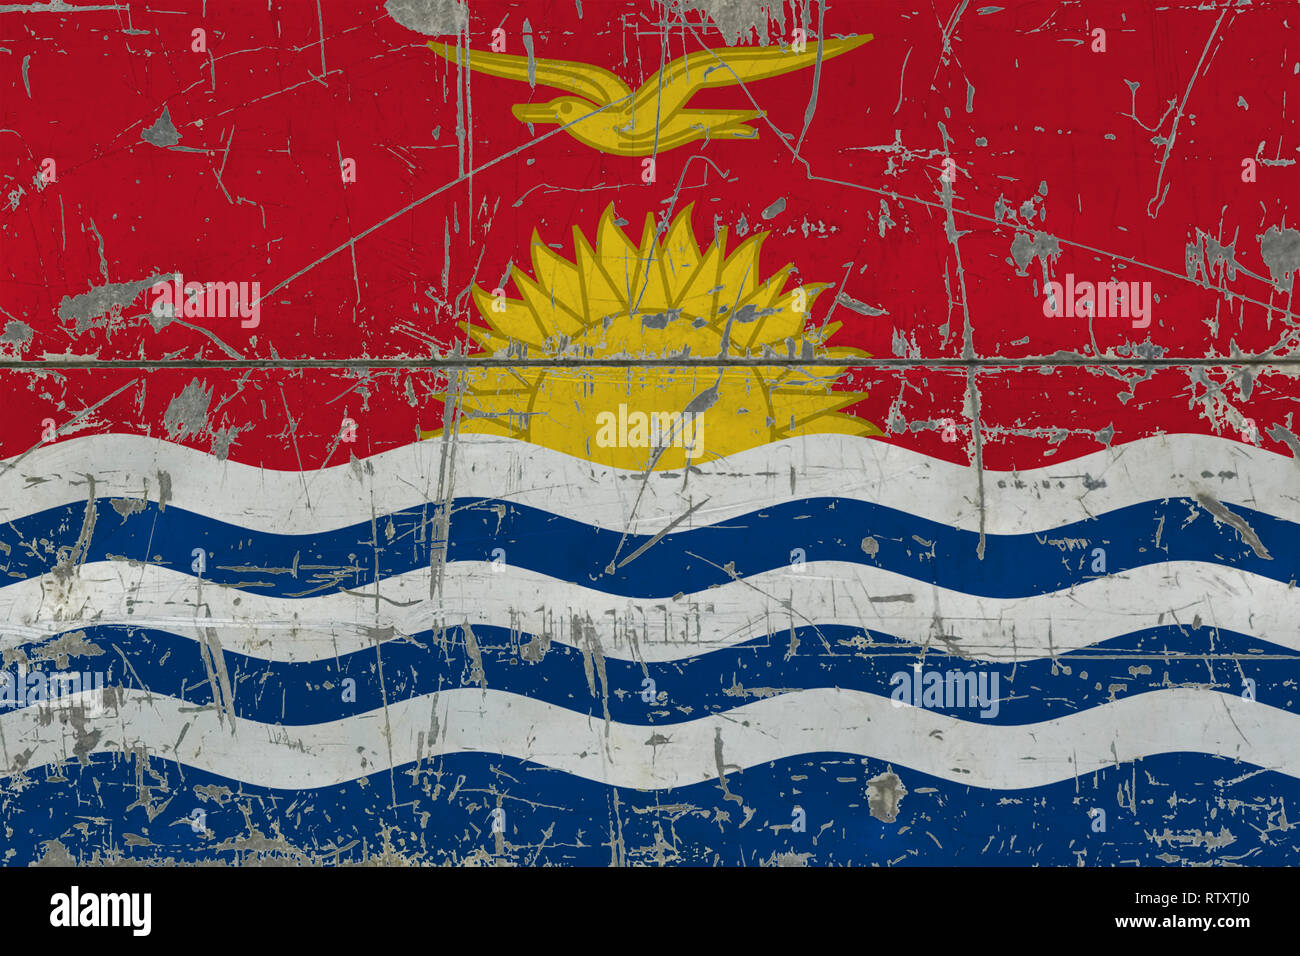 Grunge Kiribati flag on old scratched wooden surface. National vintage background. - Stock Image